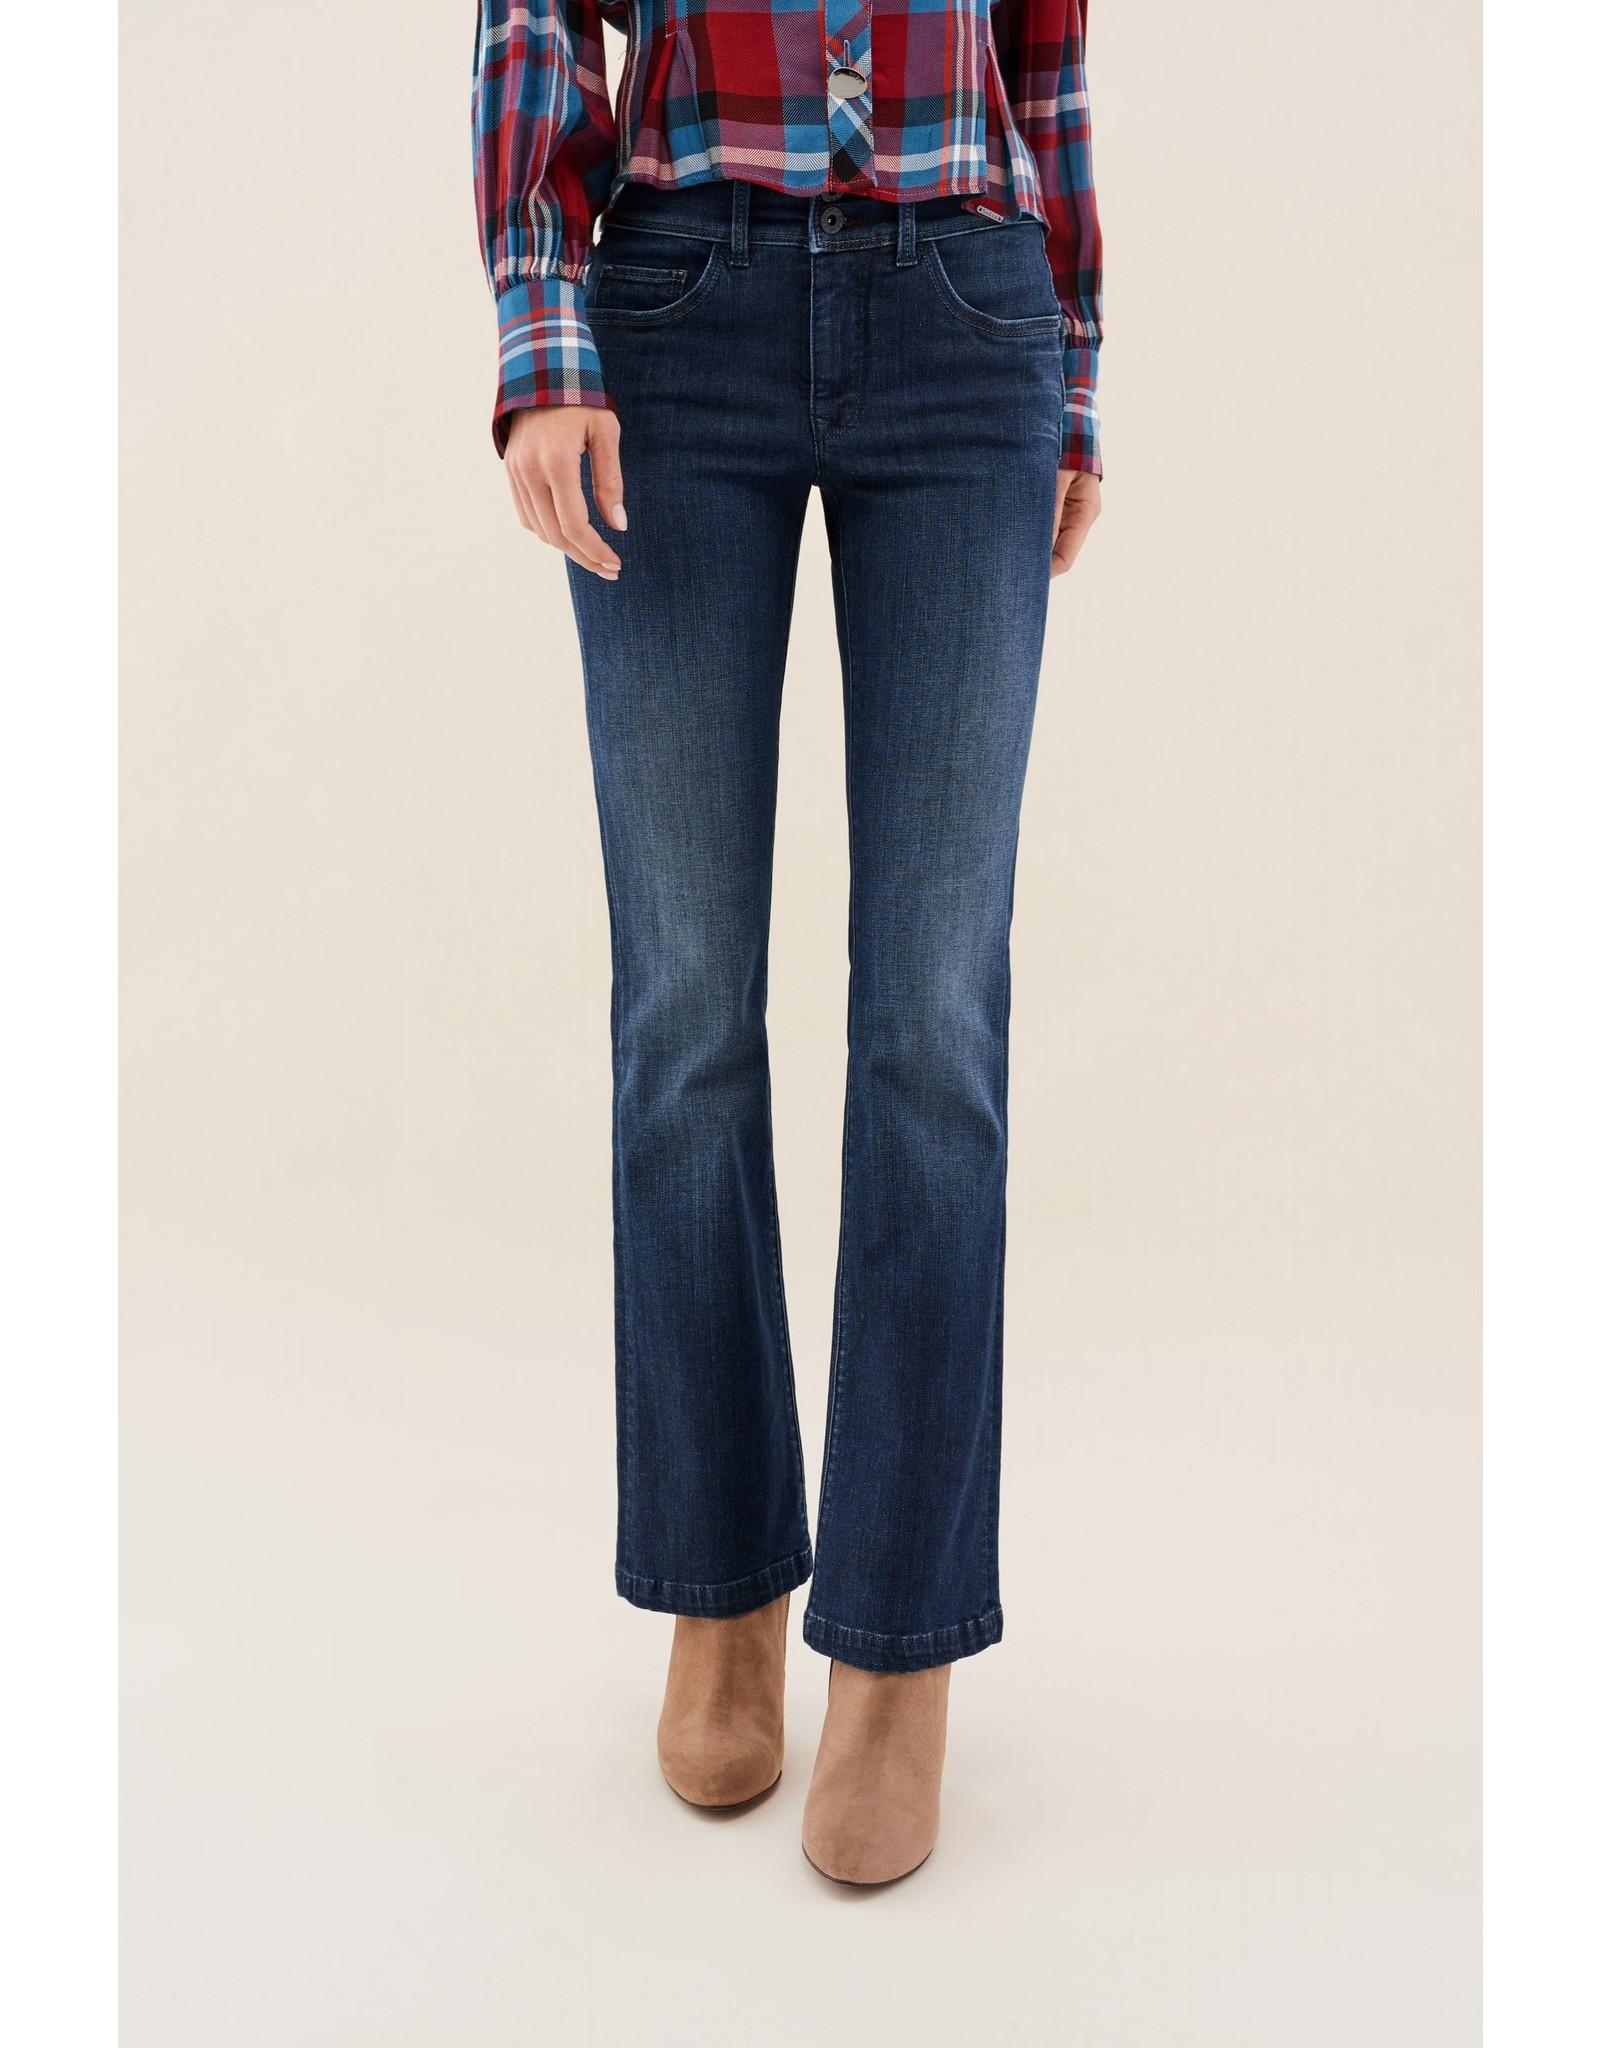 Salsa Jeans Secret Push In Bootcut Jeans